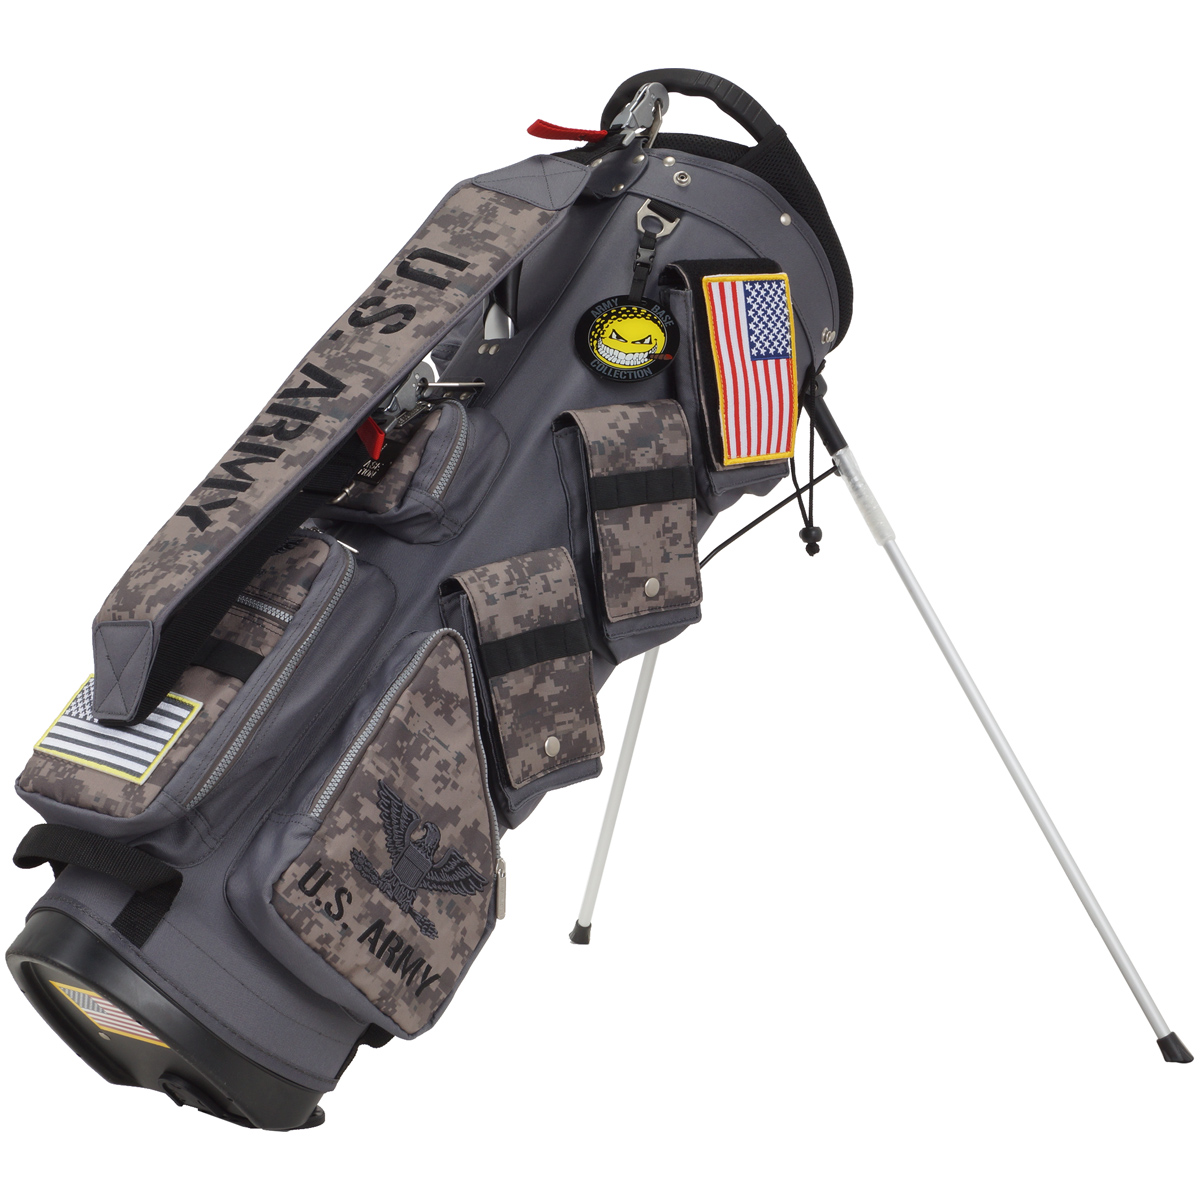 U.S. ARMY スタンドキャディバッグ